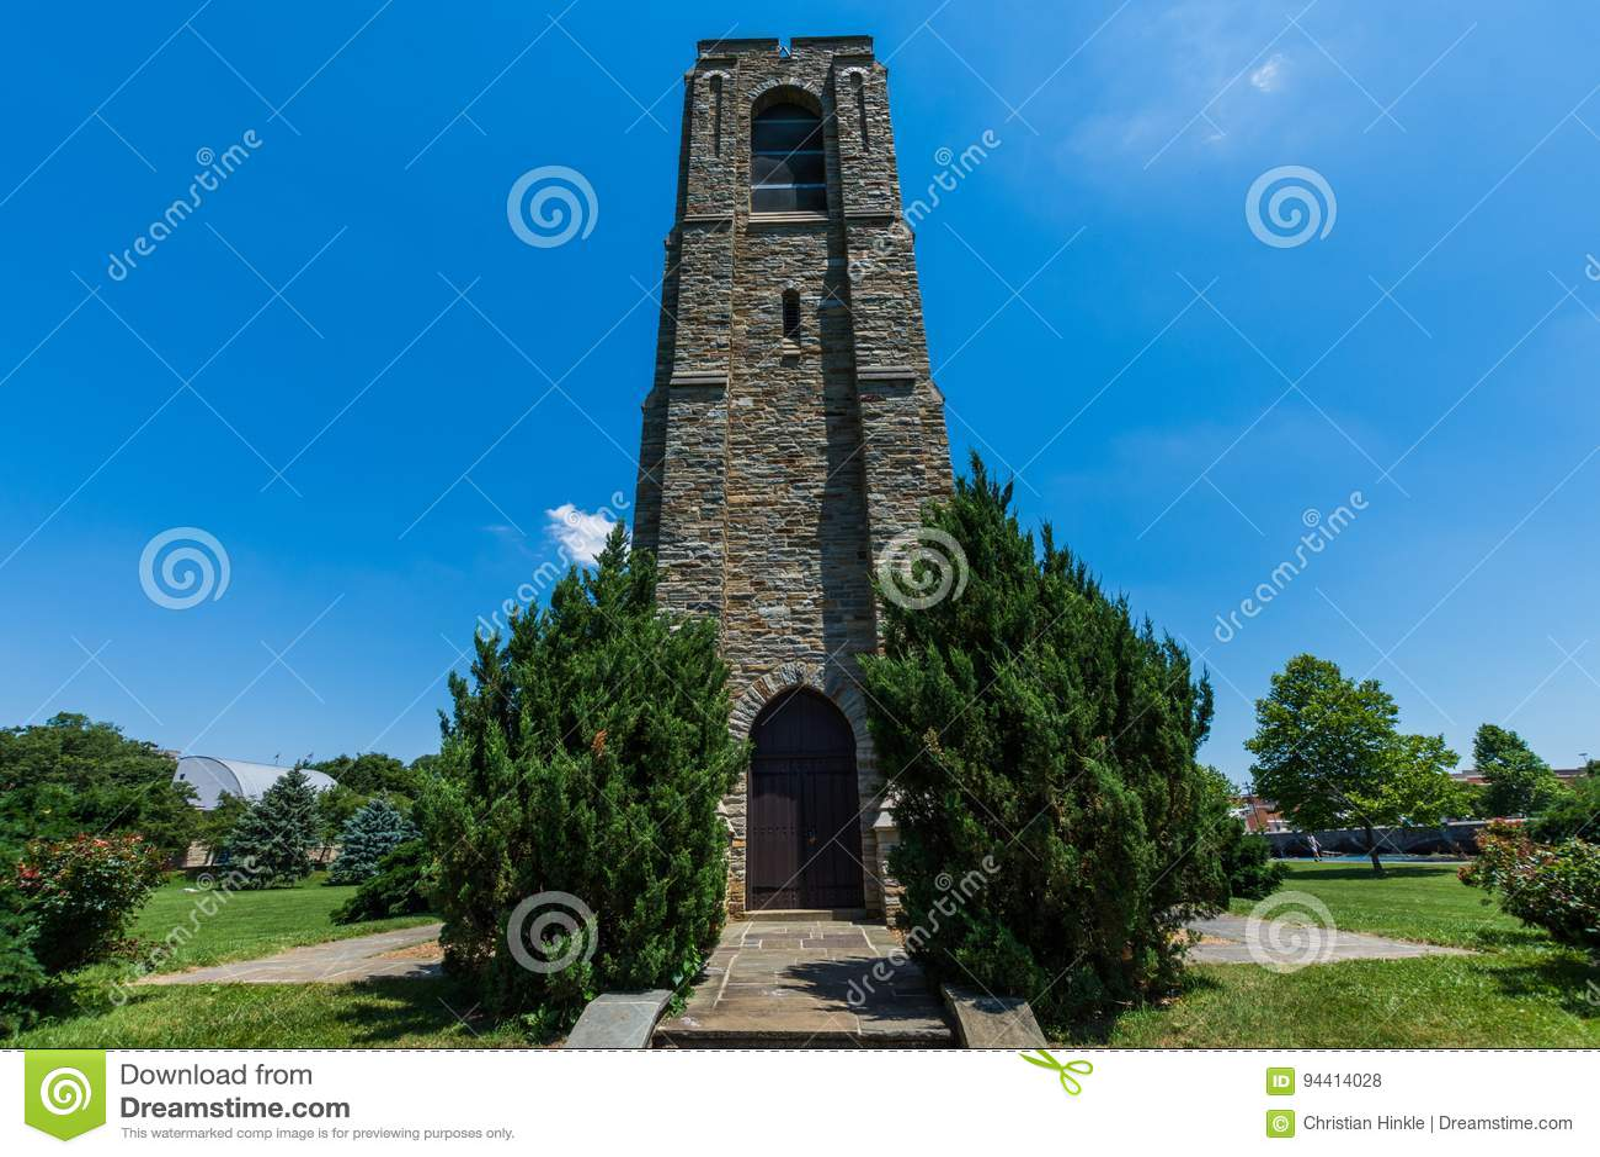 Joseph Dill Baker Memorial Carillion-de Bouw in Frederick, Mary